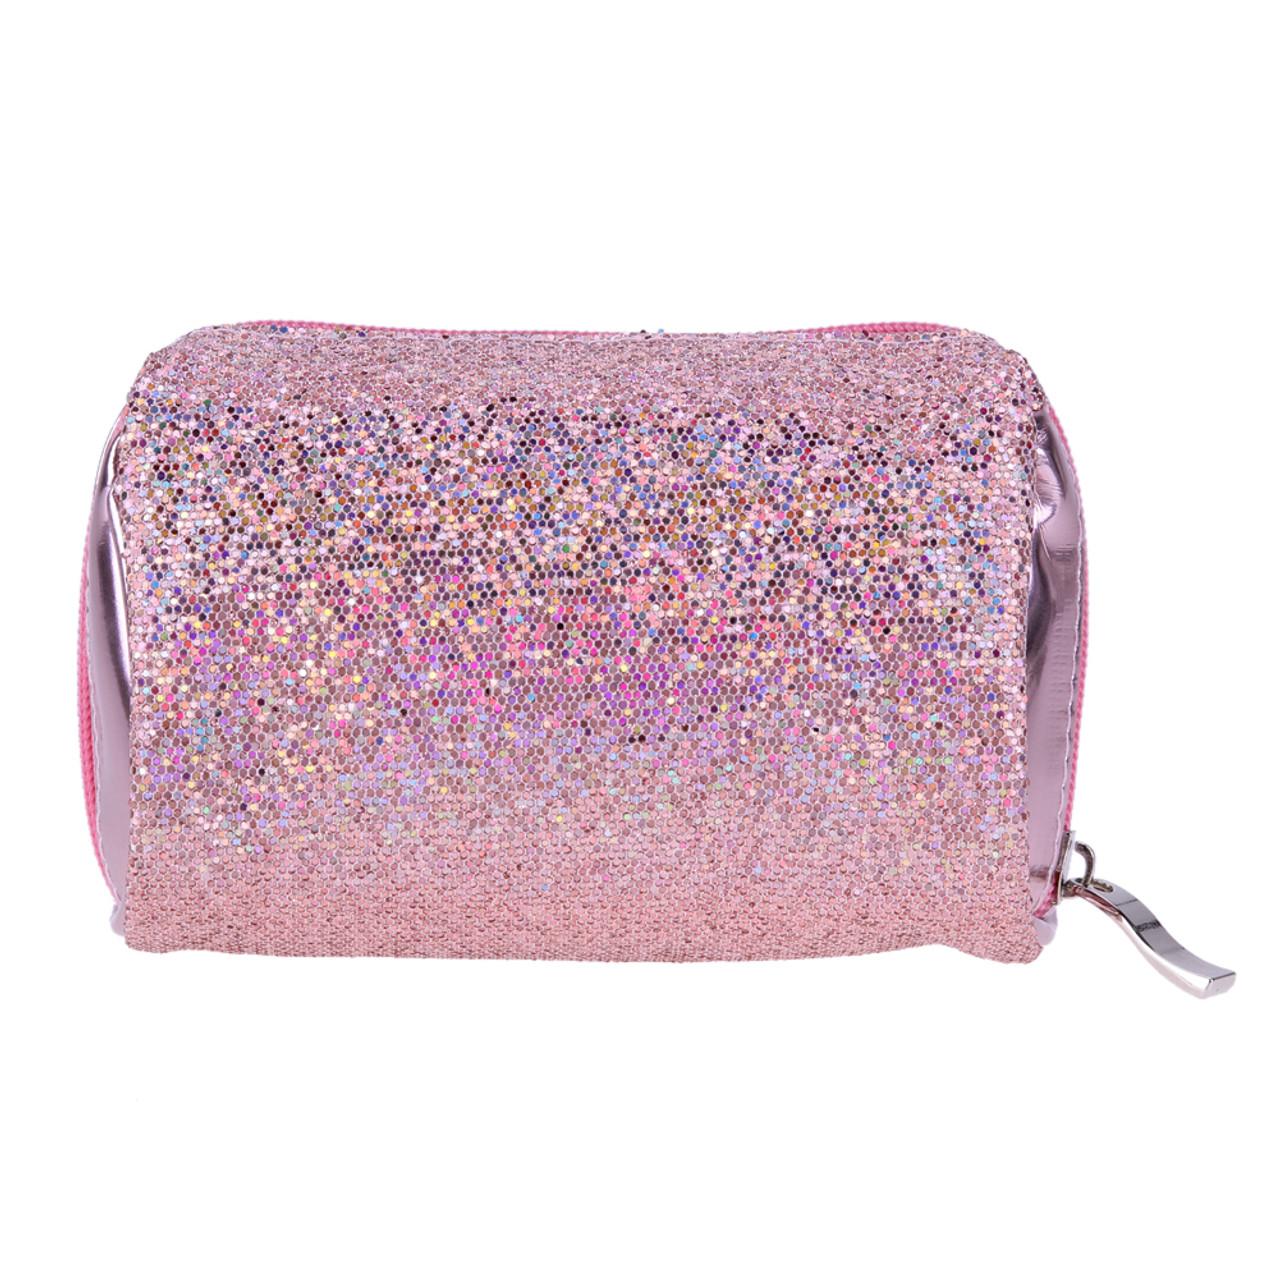 7cdb4402ff Sequins Portable Cosmetic Bag Multifunction Toiletry Organizer Zipper  Makeup Bag Women Makeup Pouch Bling Toiletry Organizer